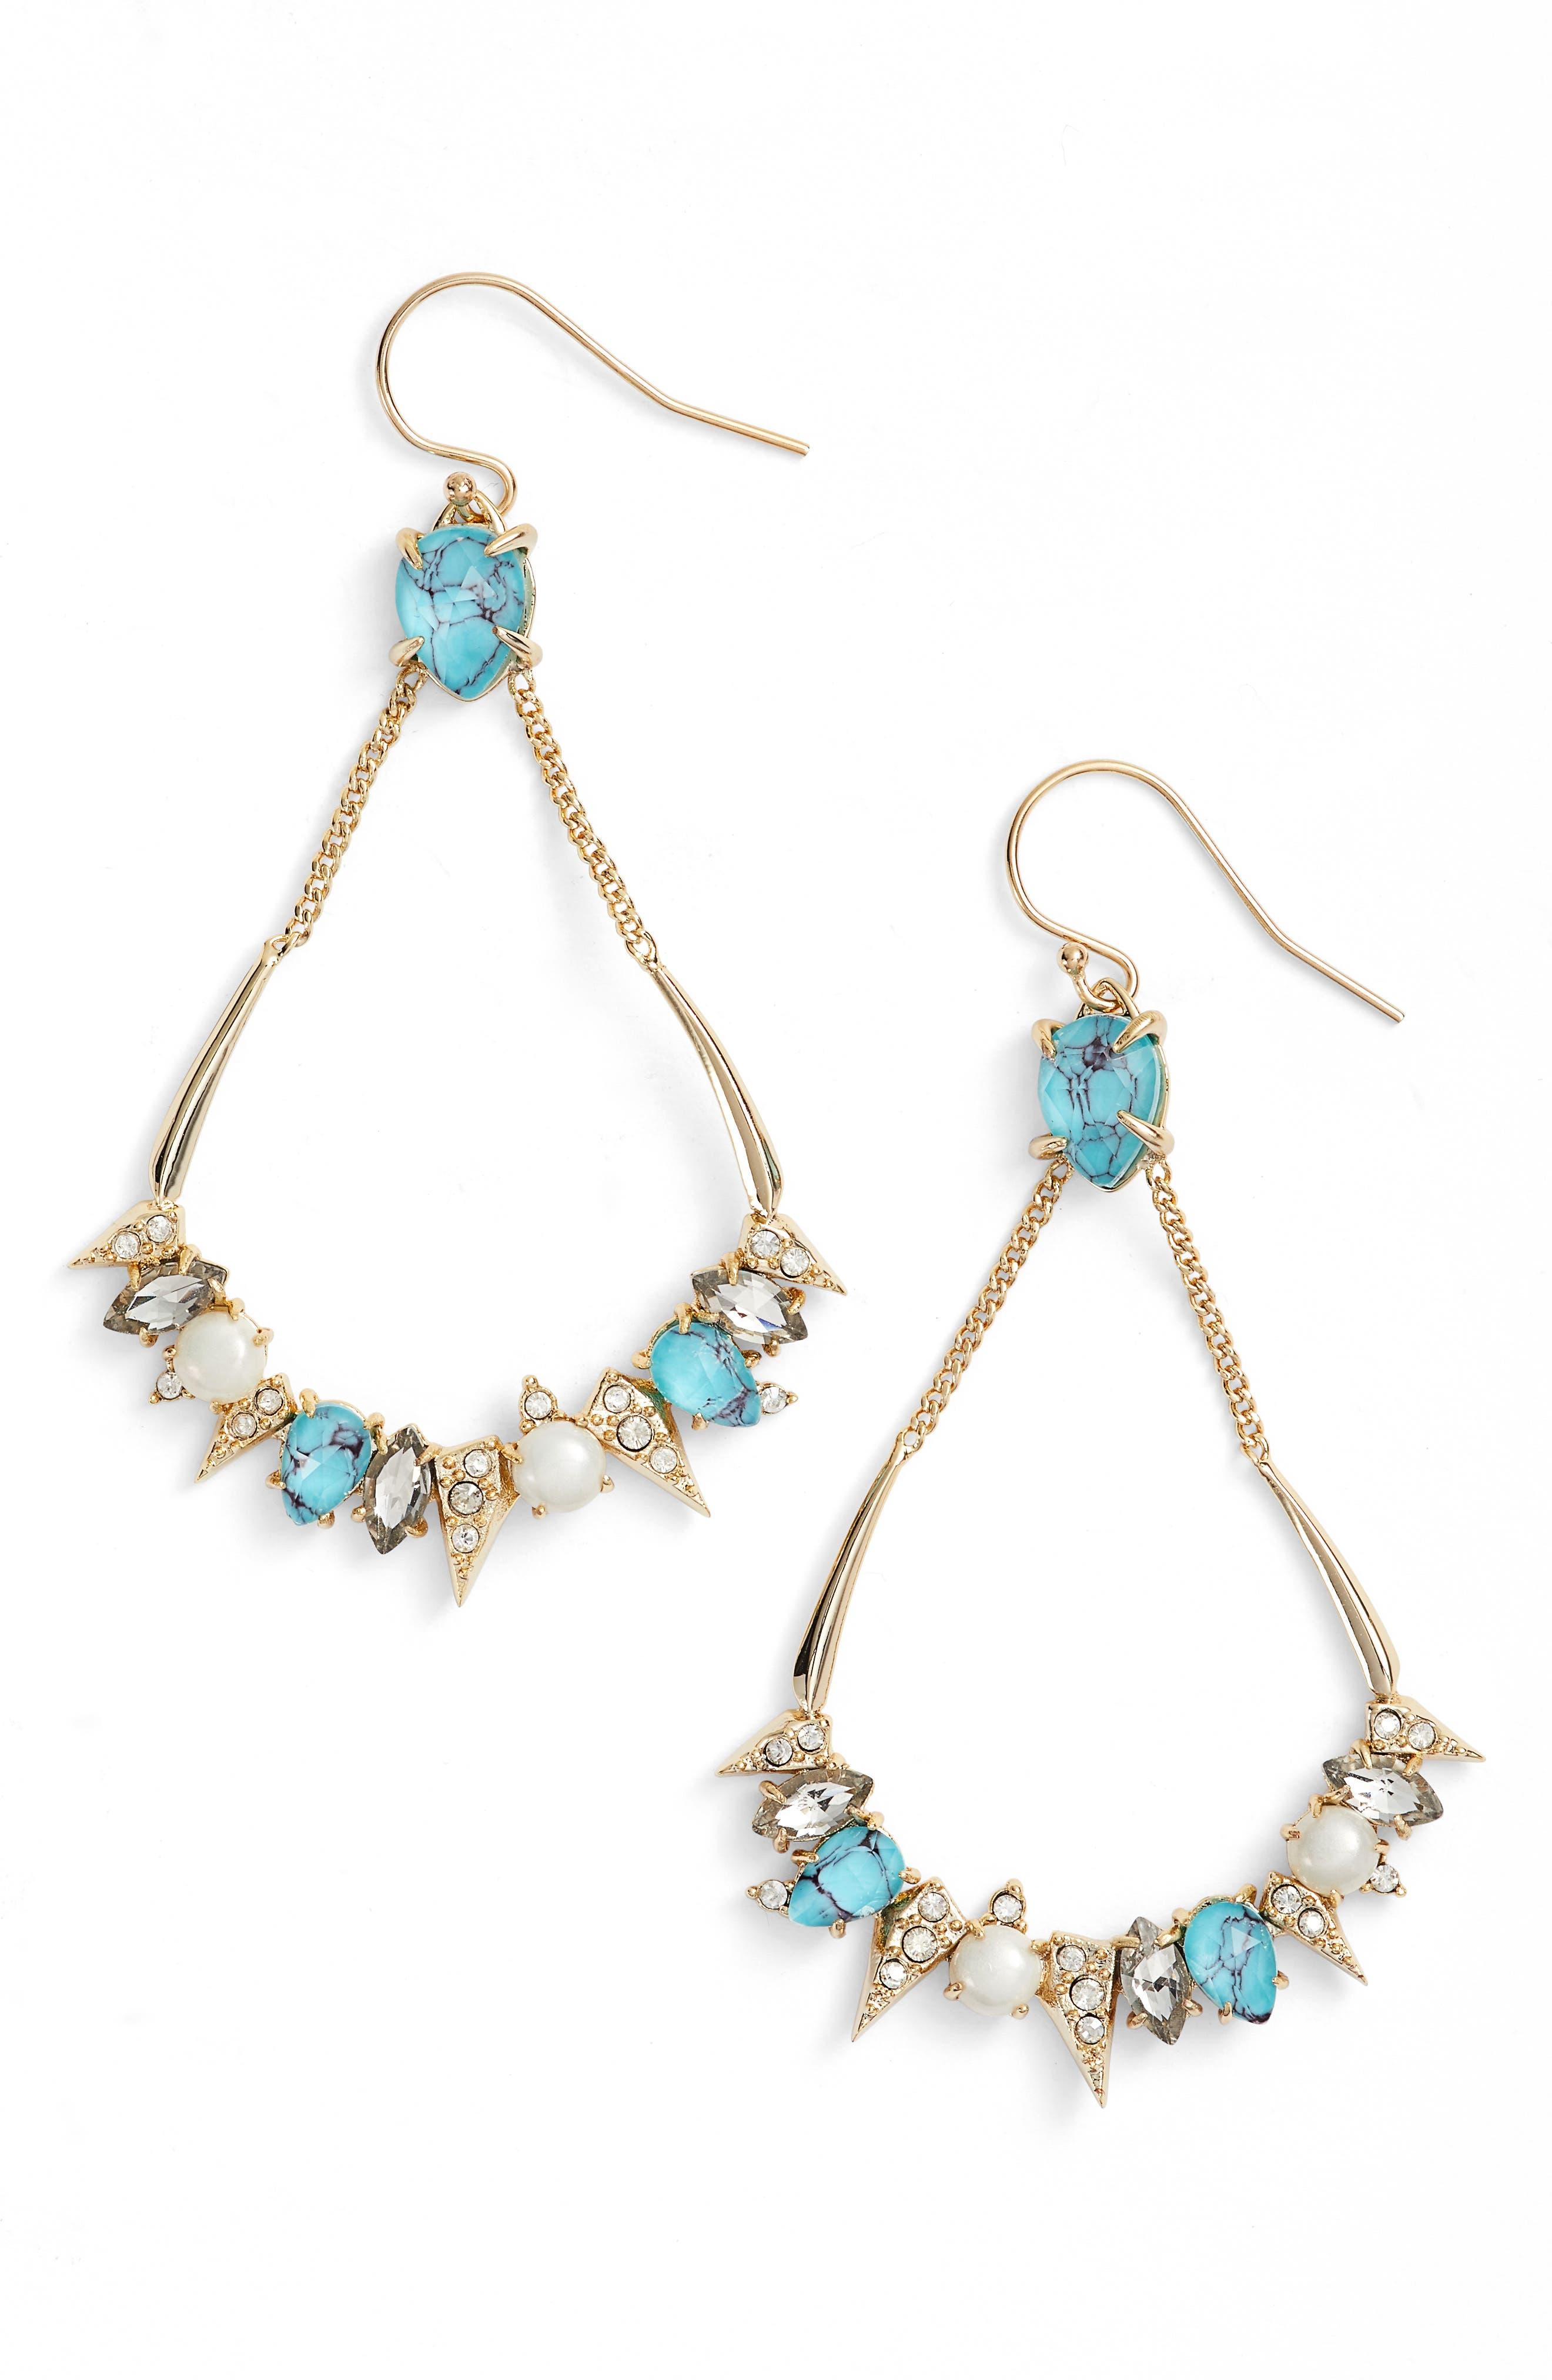 Alexis Bittar Cluster Drop Earrings